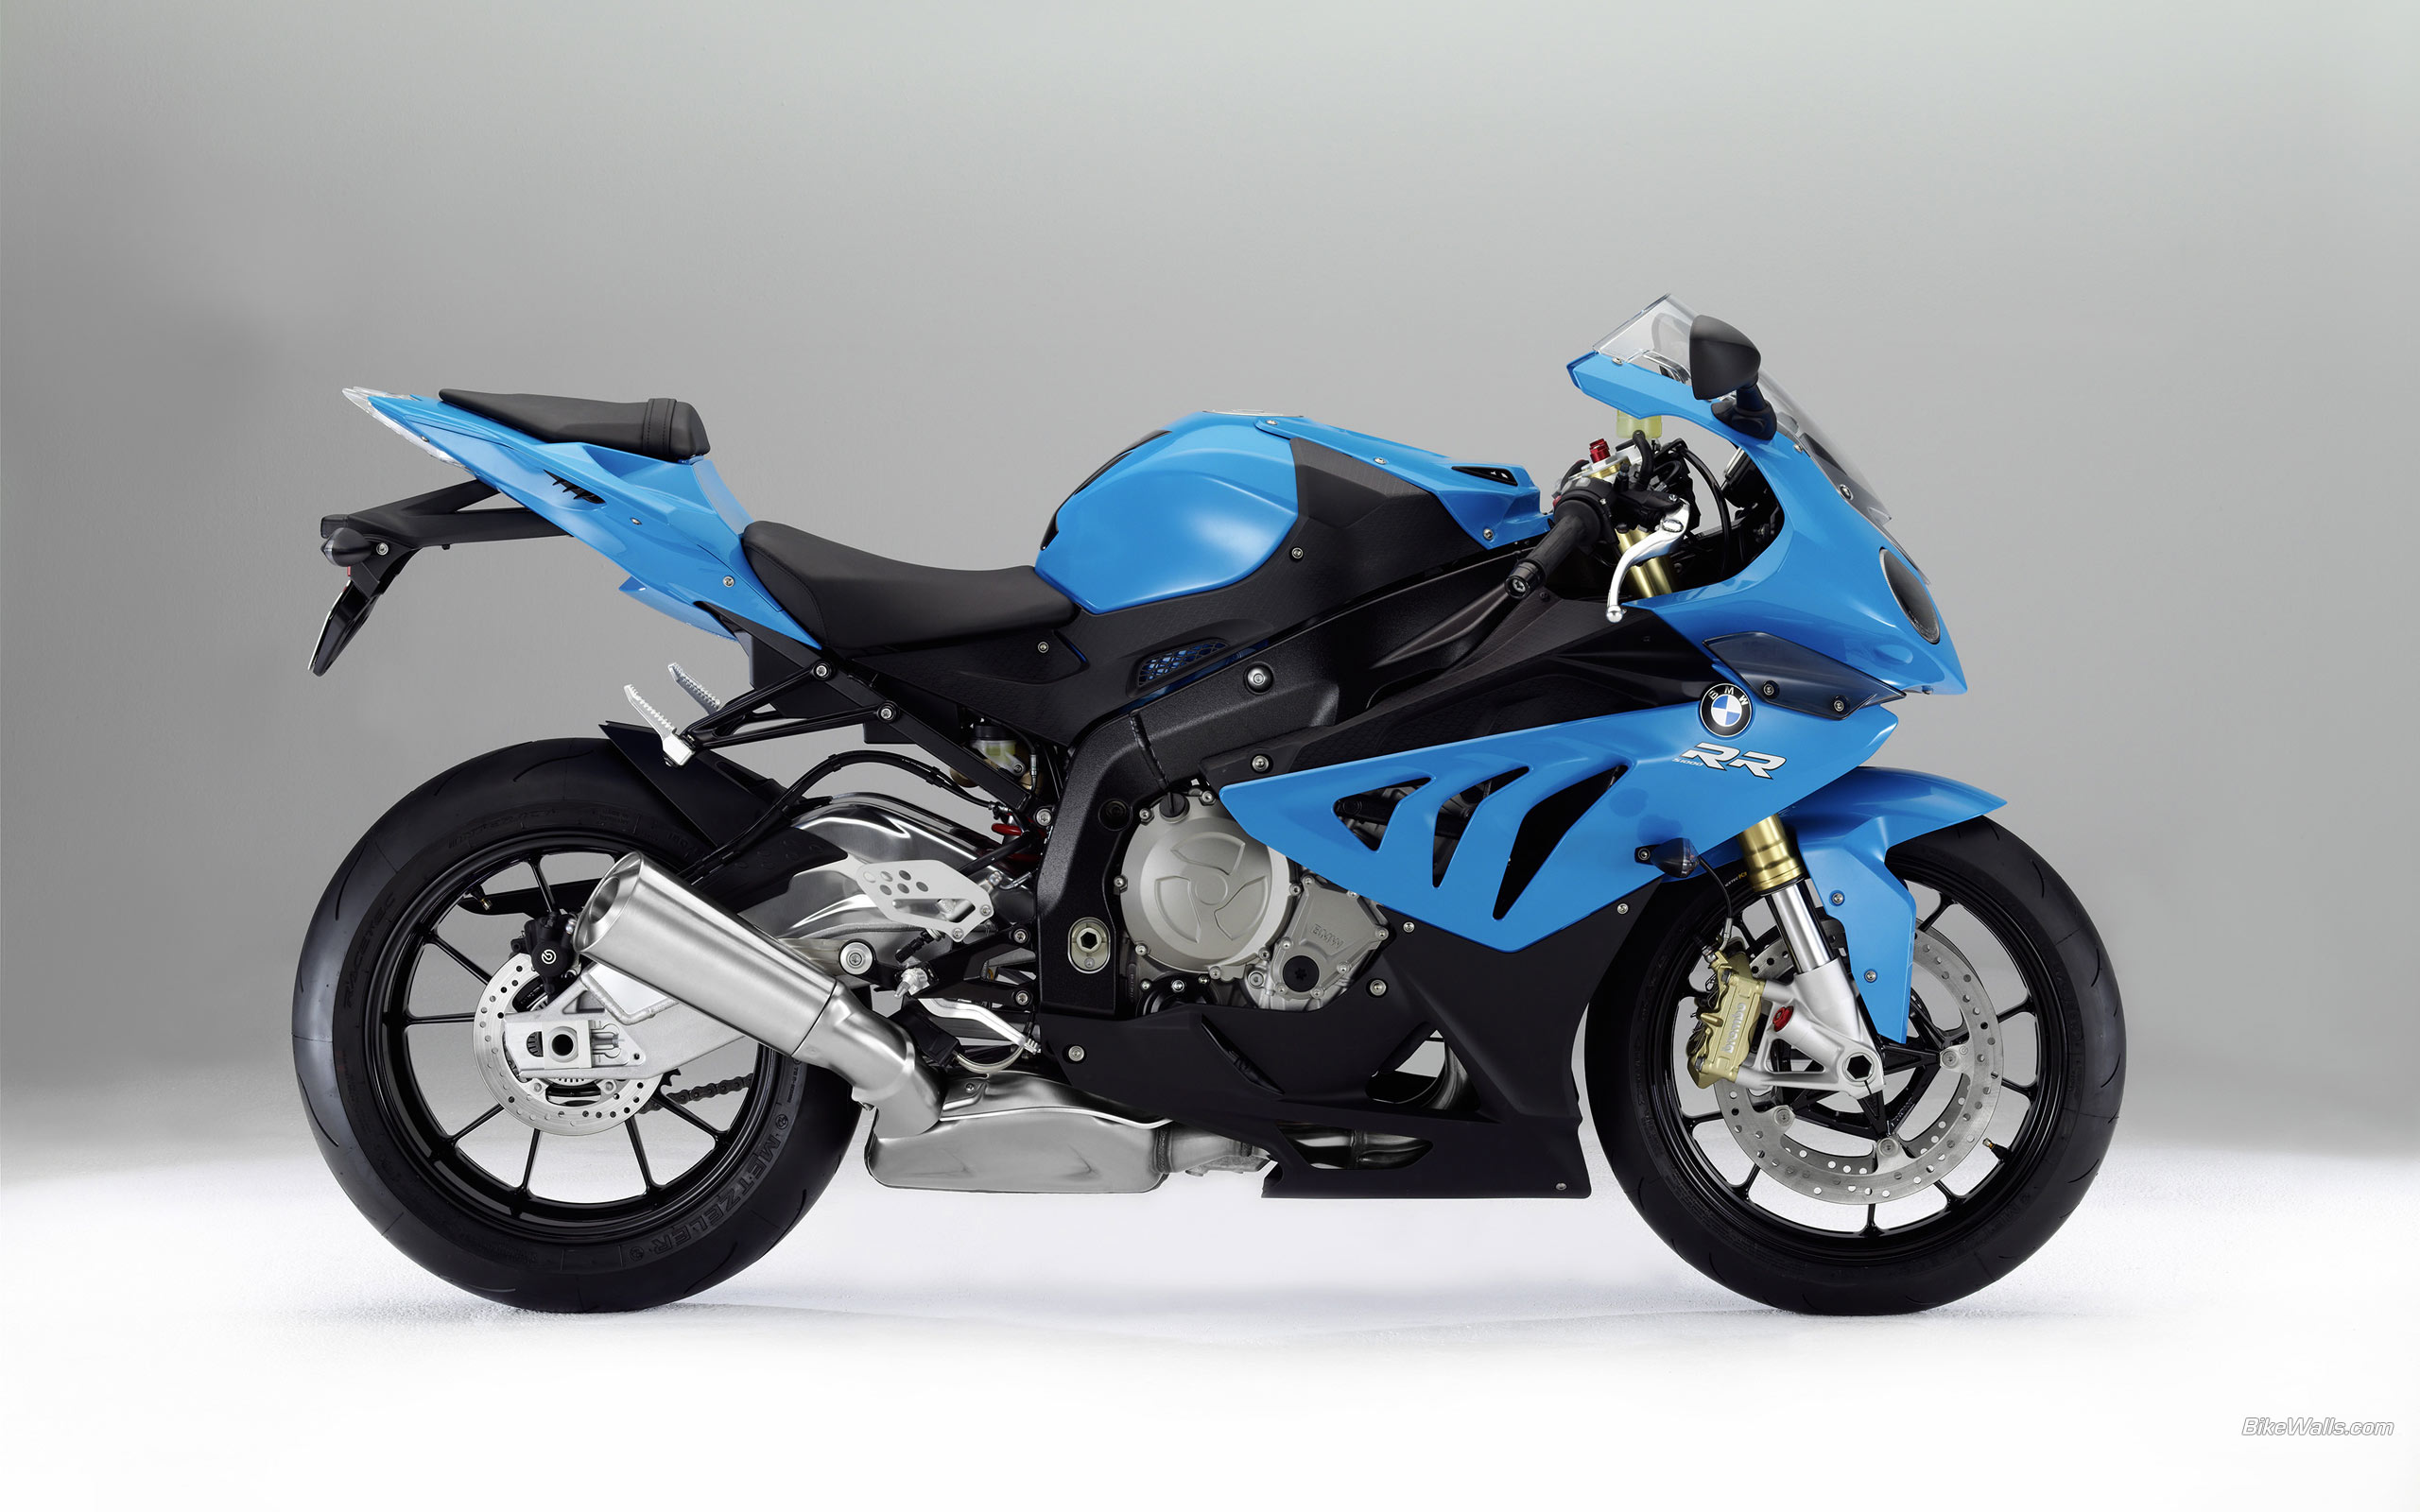 Bmw Sport S1000 Rr Motorcycles Photo 31815722 Fanpop